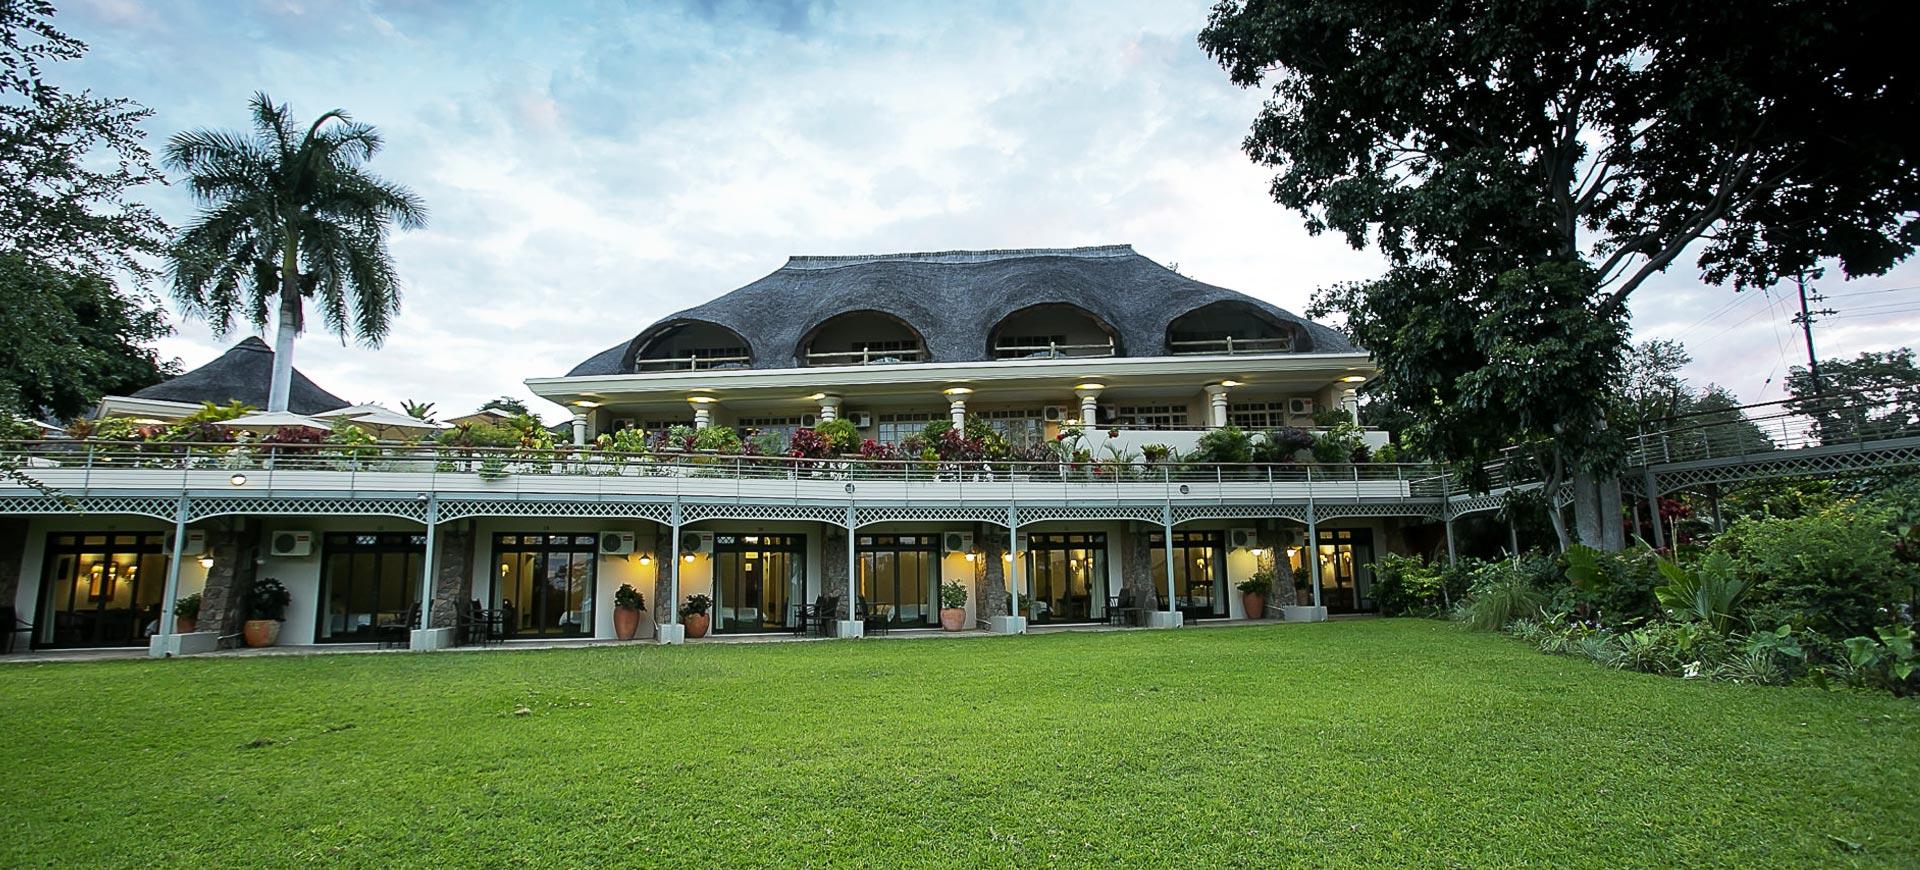 Ilala Lodge Accommodation